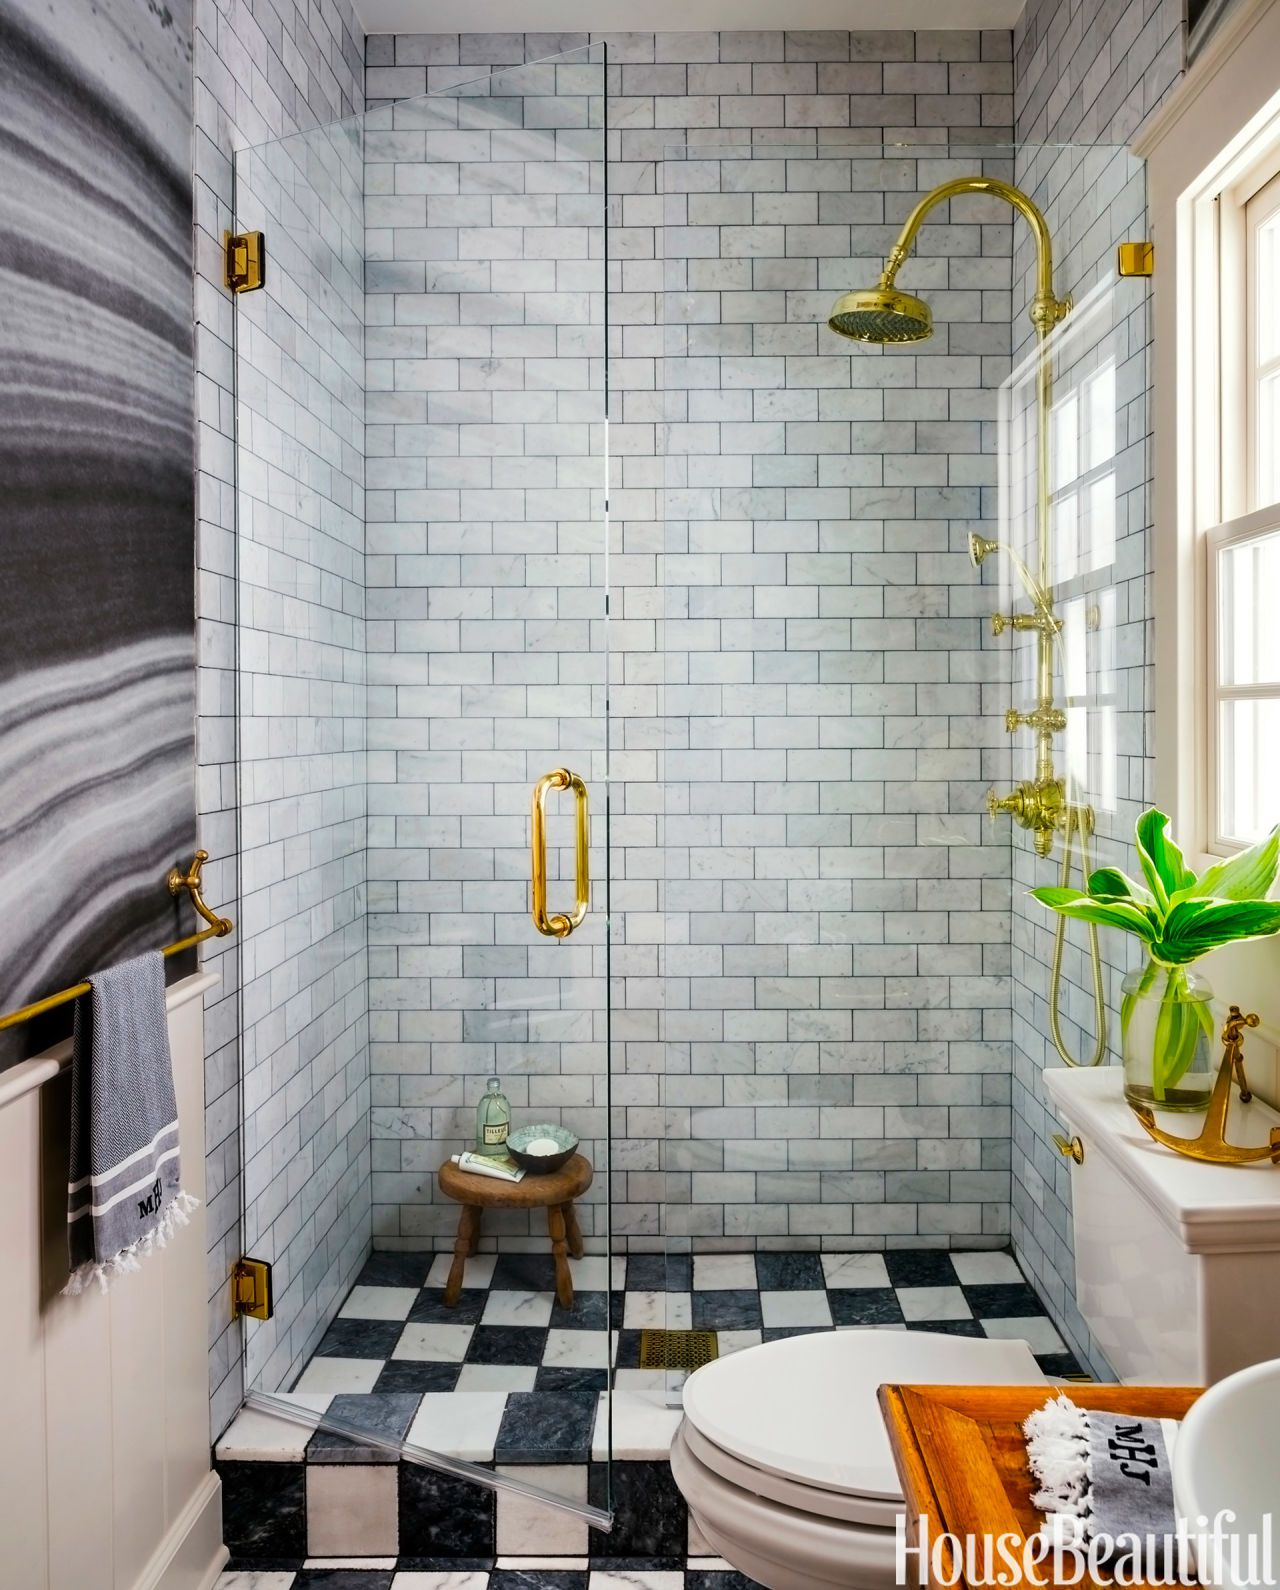 small bathrooms designs 25 small bathroom design ideas - small bathroom solutions PIKGWMP